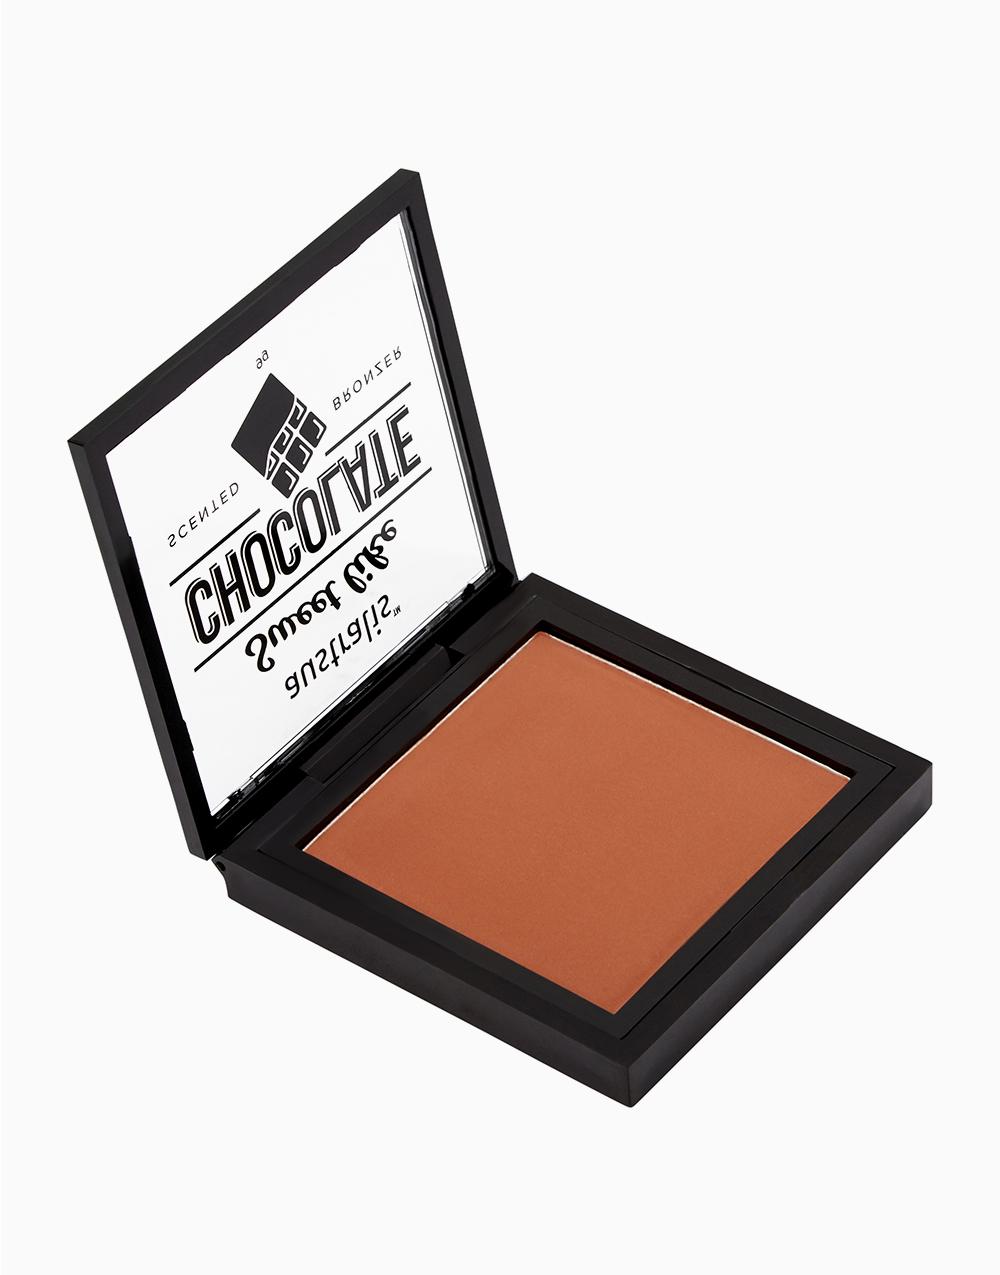 Sweet Like Chocolate Bronzer by Australis | Bittersweet Bronze